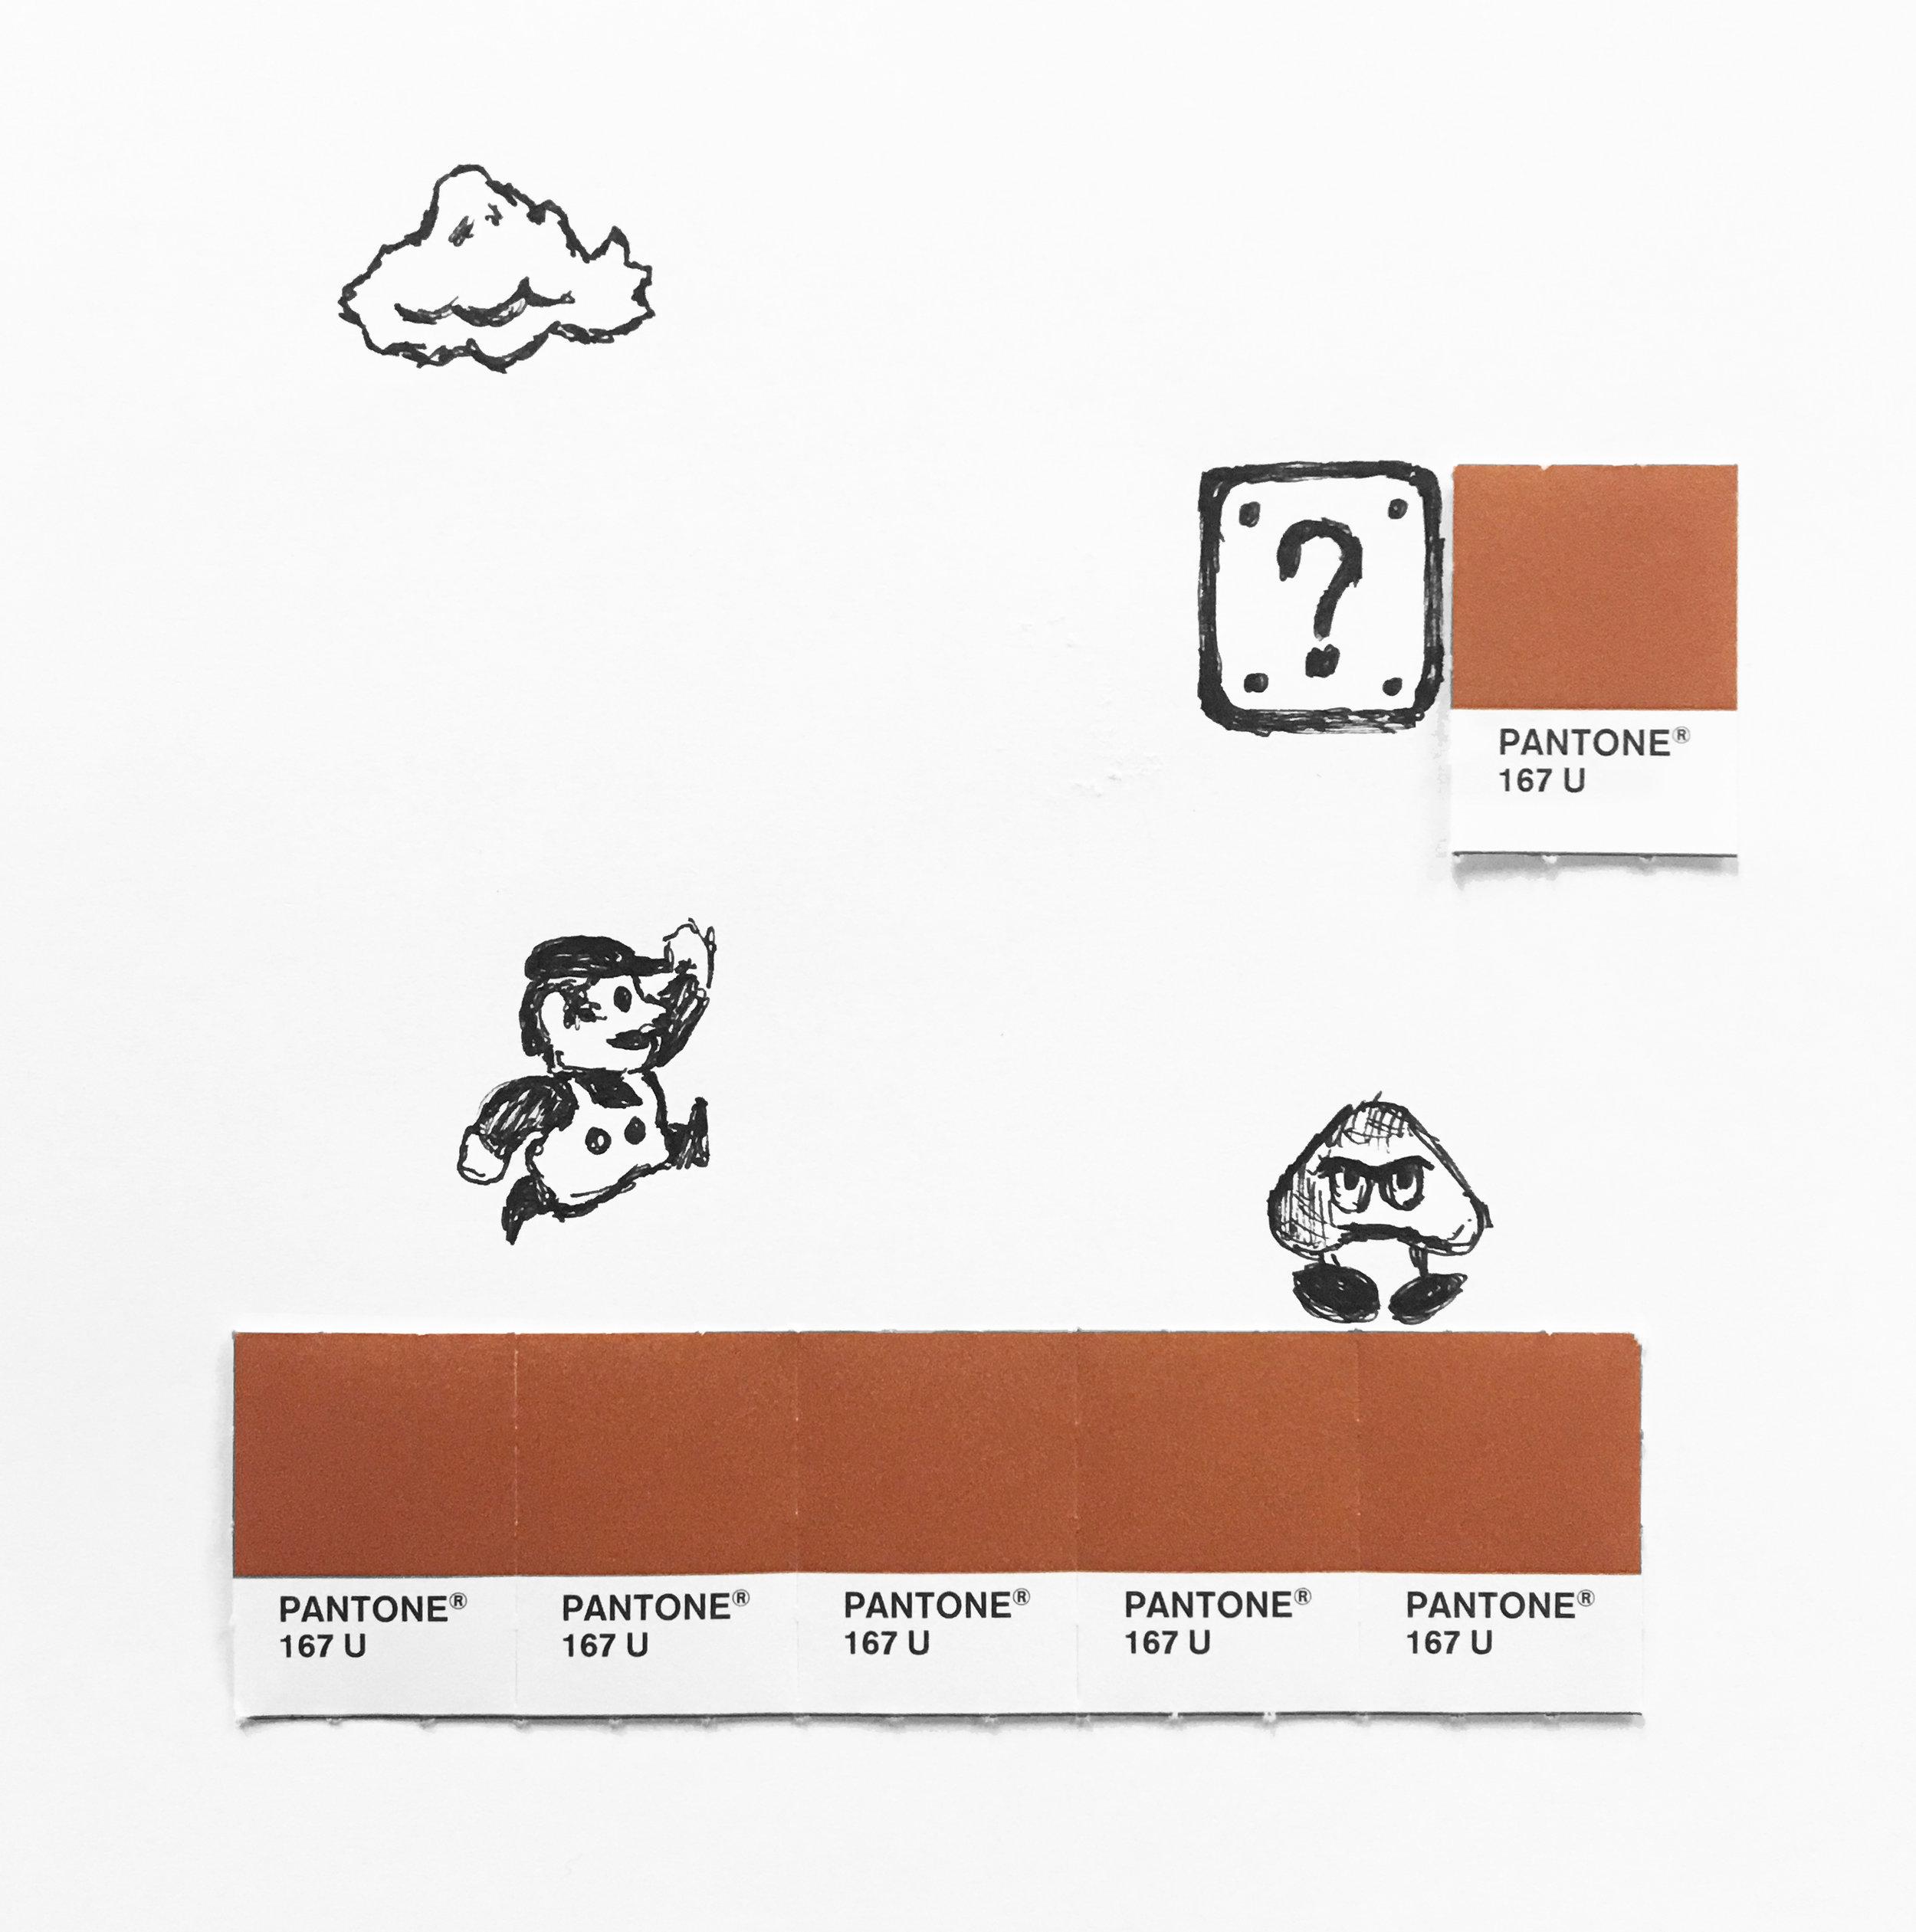 jordan-fretz-design-pantone-mario-interactive-illustration.jpg